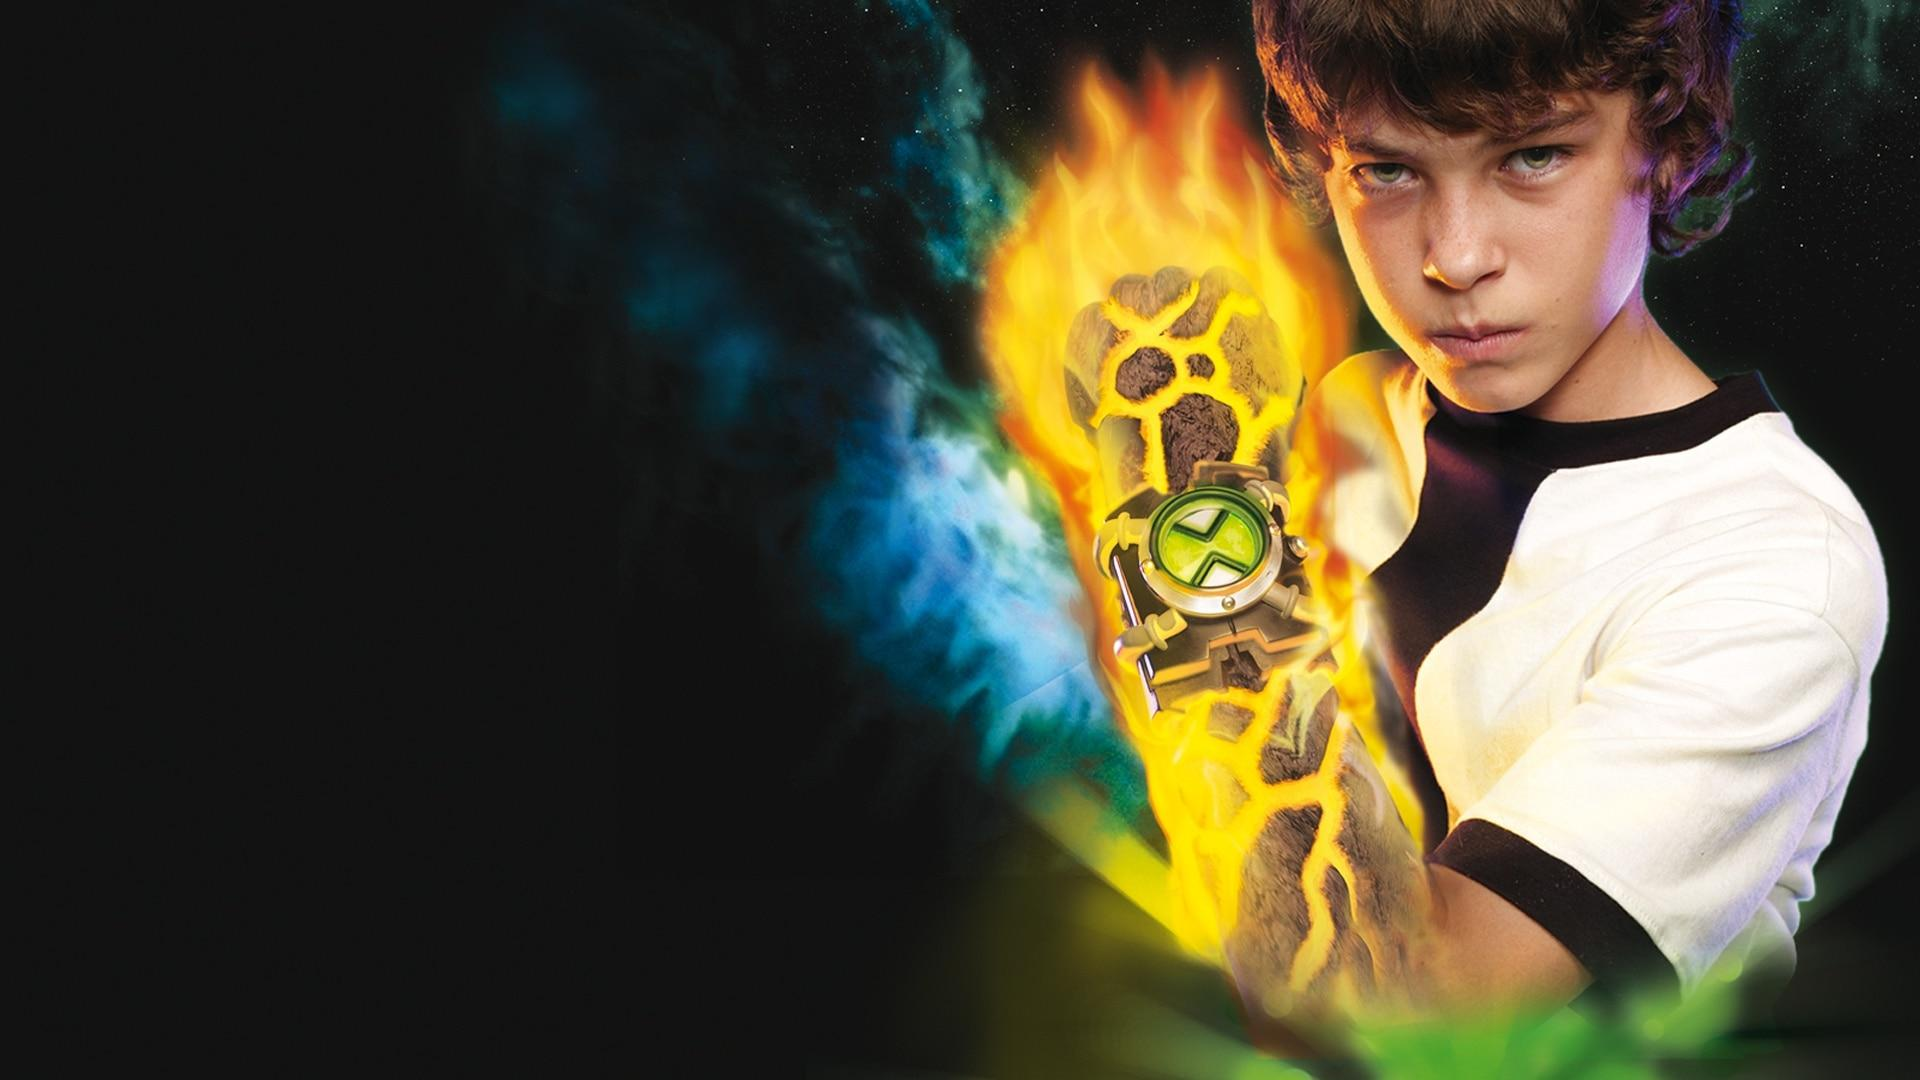 Boomerang Ben 10 - Corsa contro il tempo